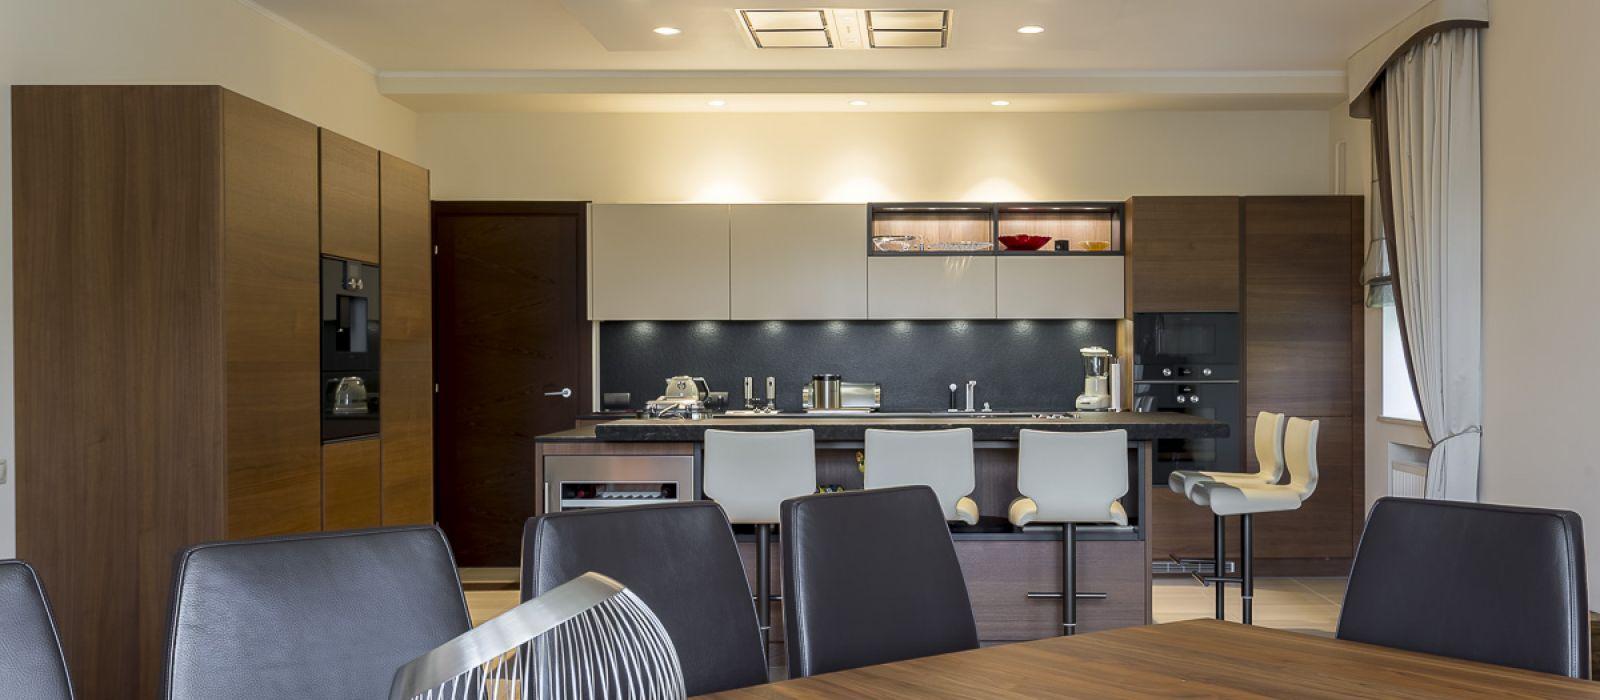 реализованный проект кухни Leicht Avance H и Classic Fs ляйхт